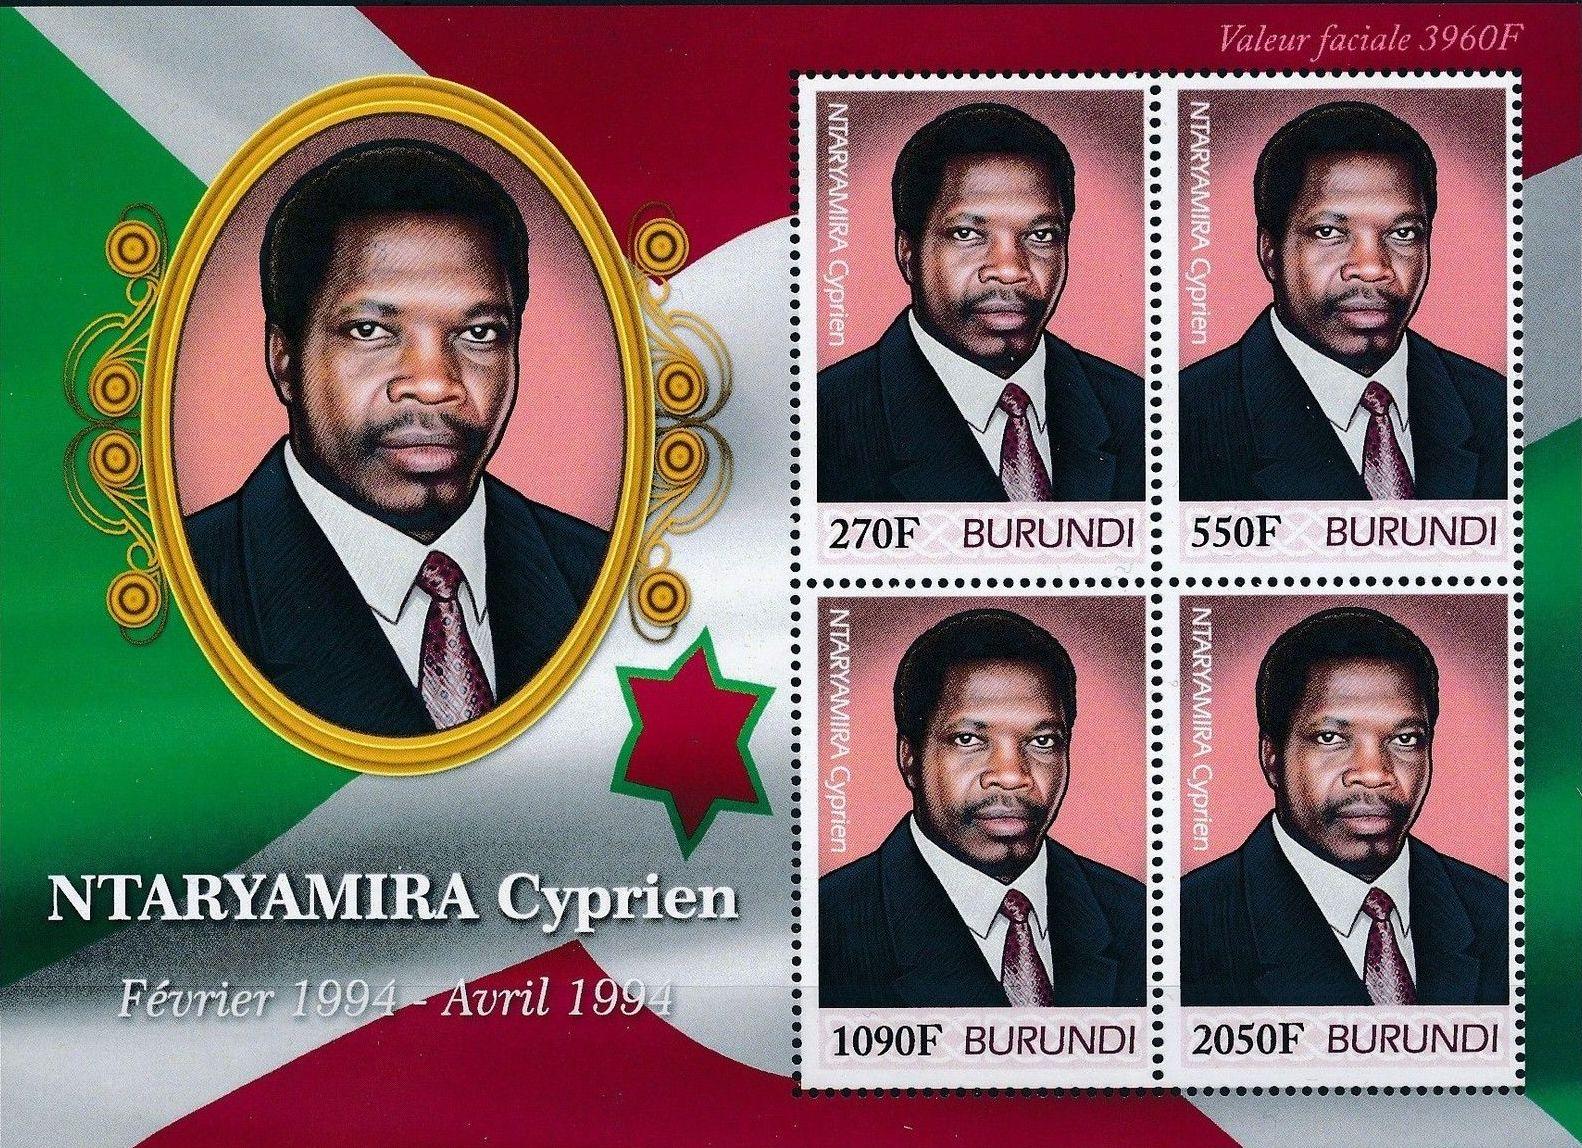 Burundi 2012 Presidents of Burundi - Cyprien Ntaryamira g.jpg